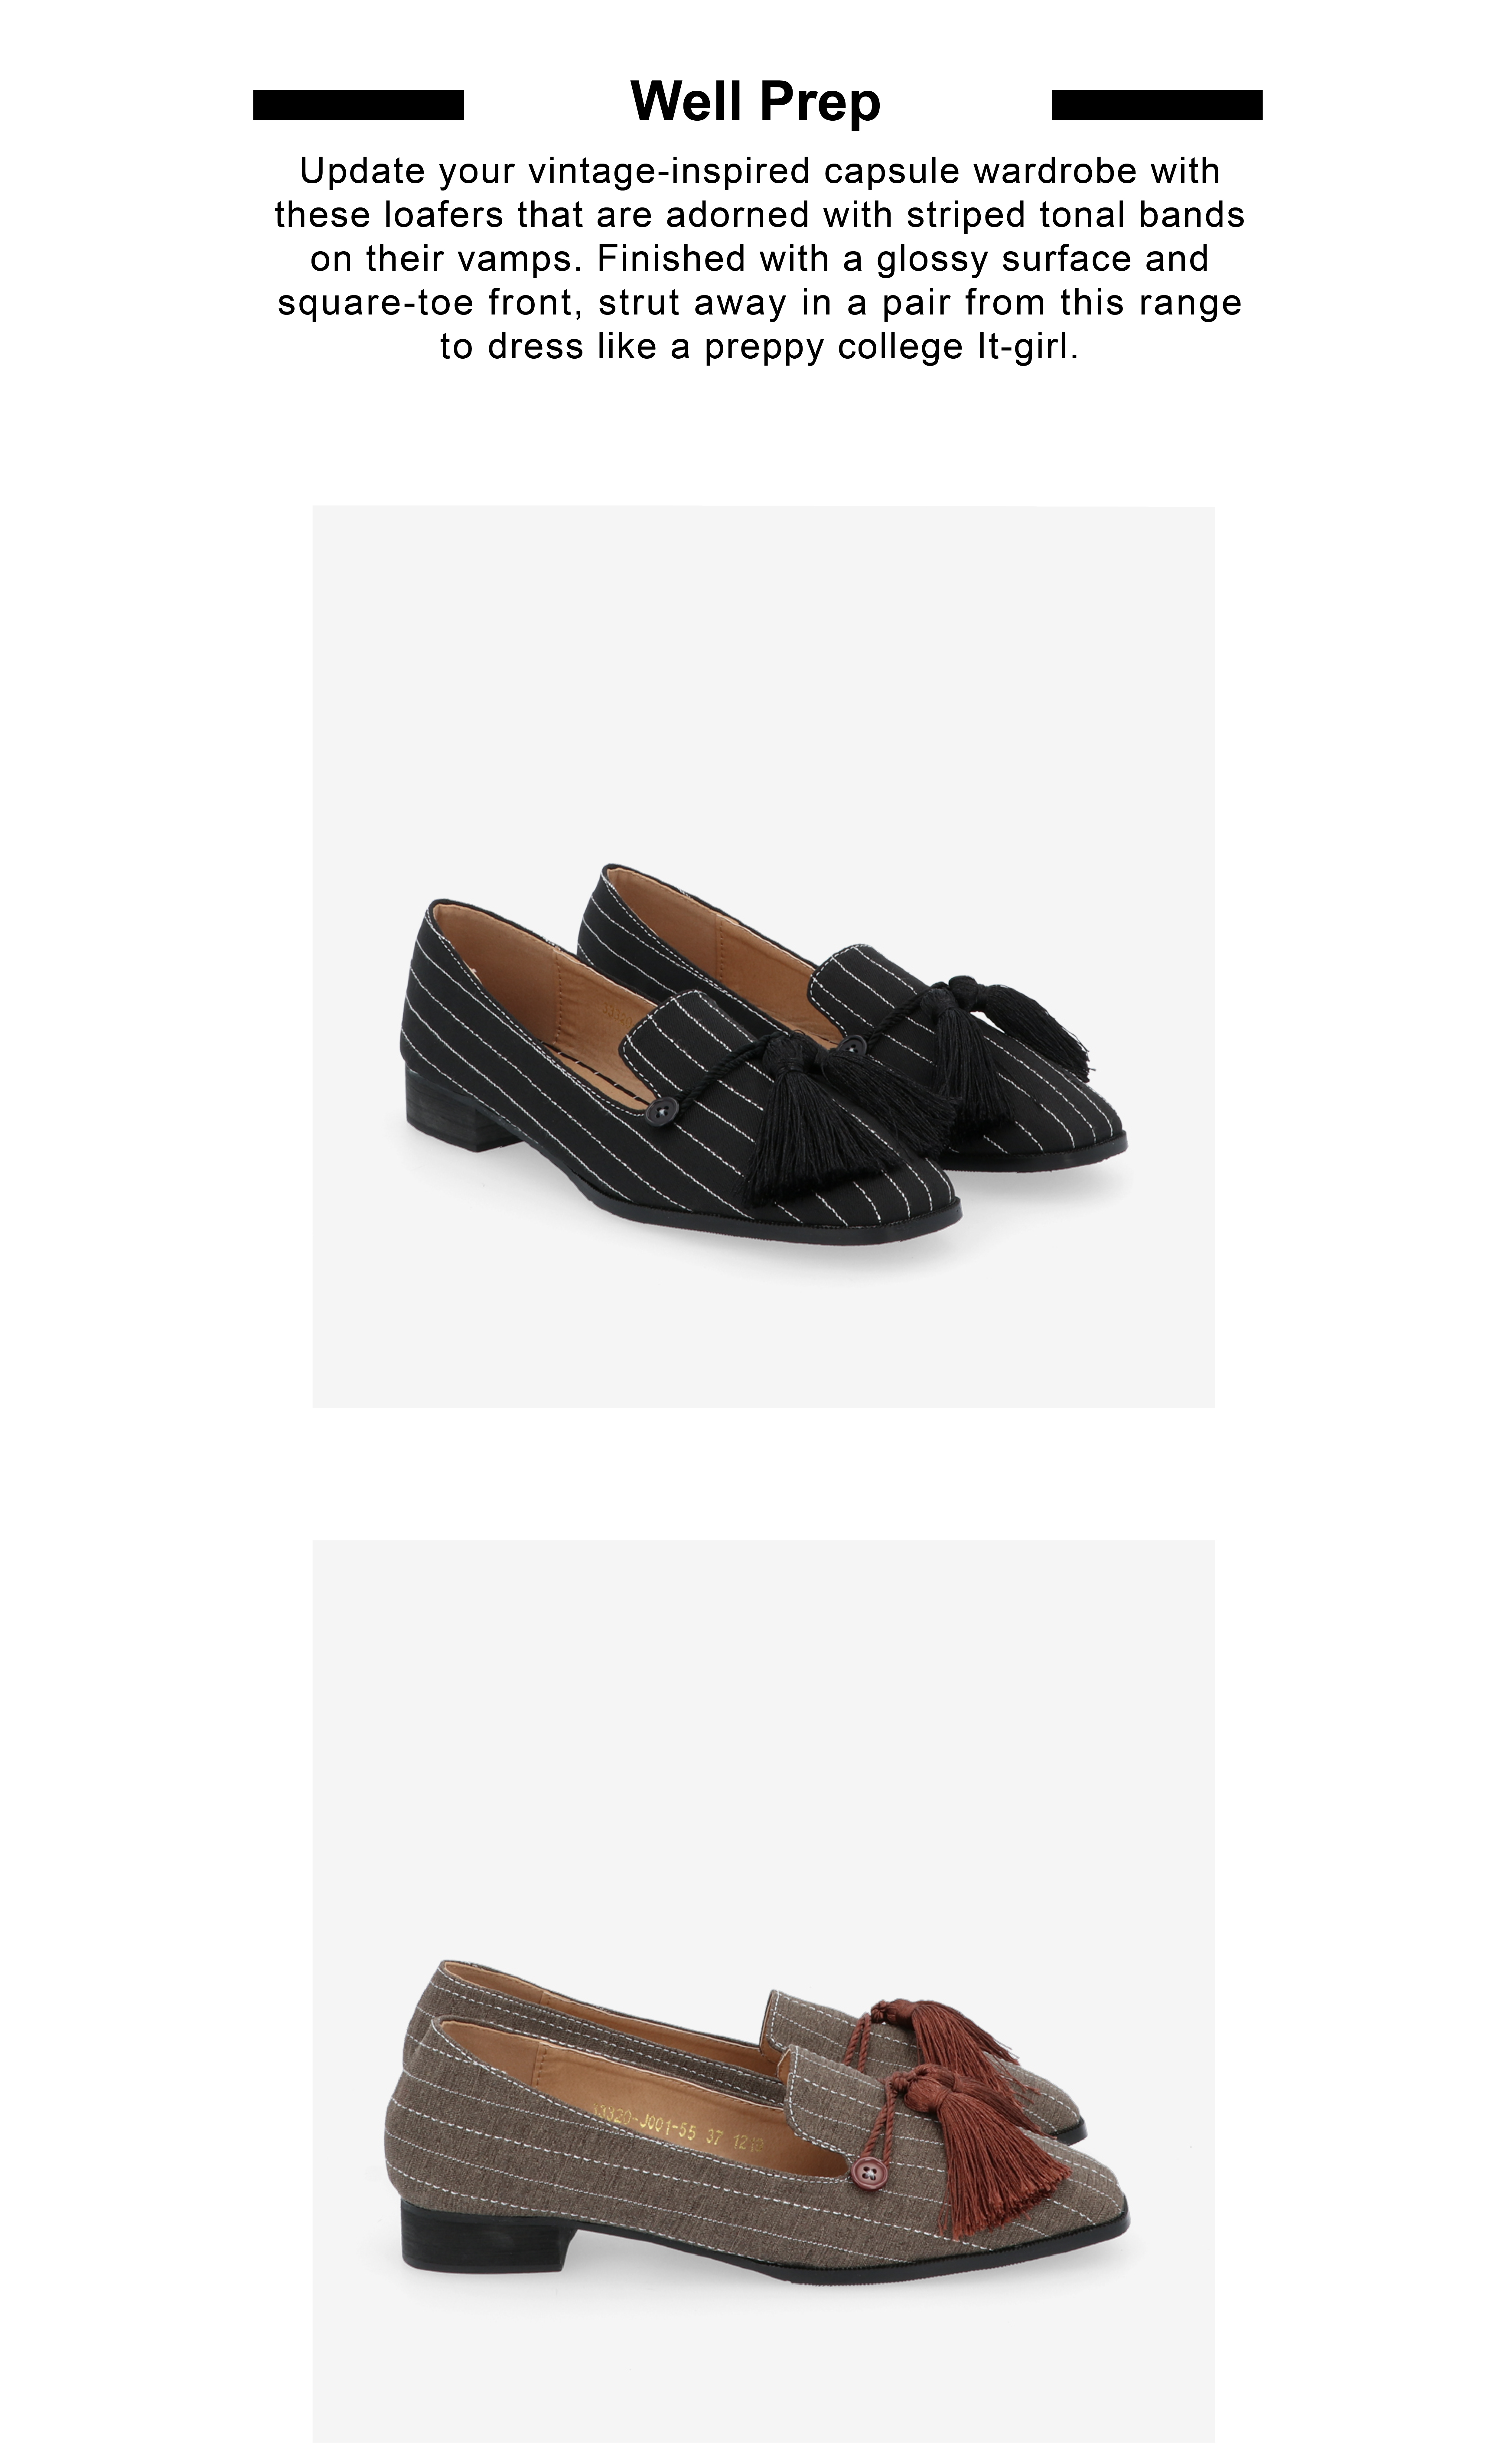 "33320 J001 02 - 1"" Suri In Stripes Loafers"